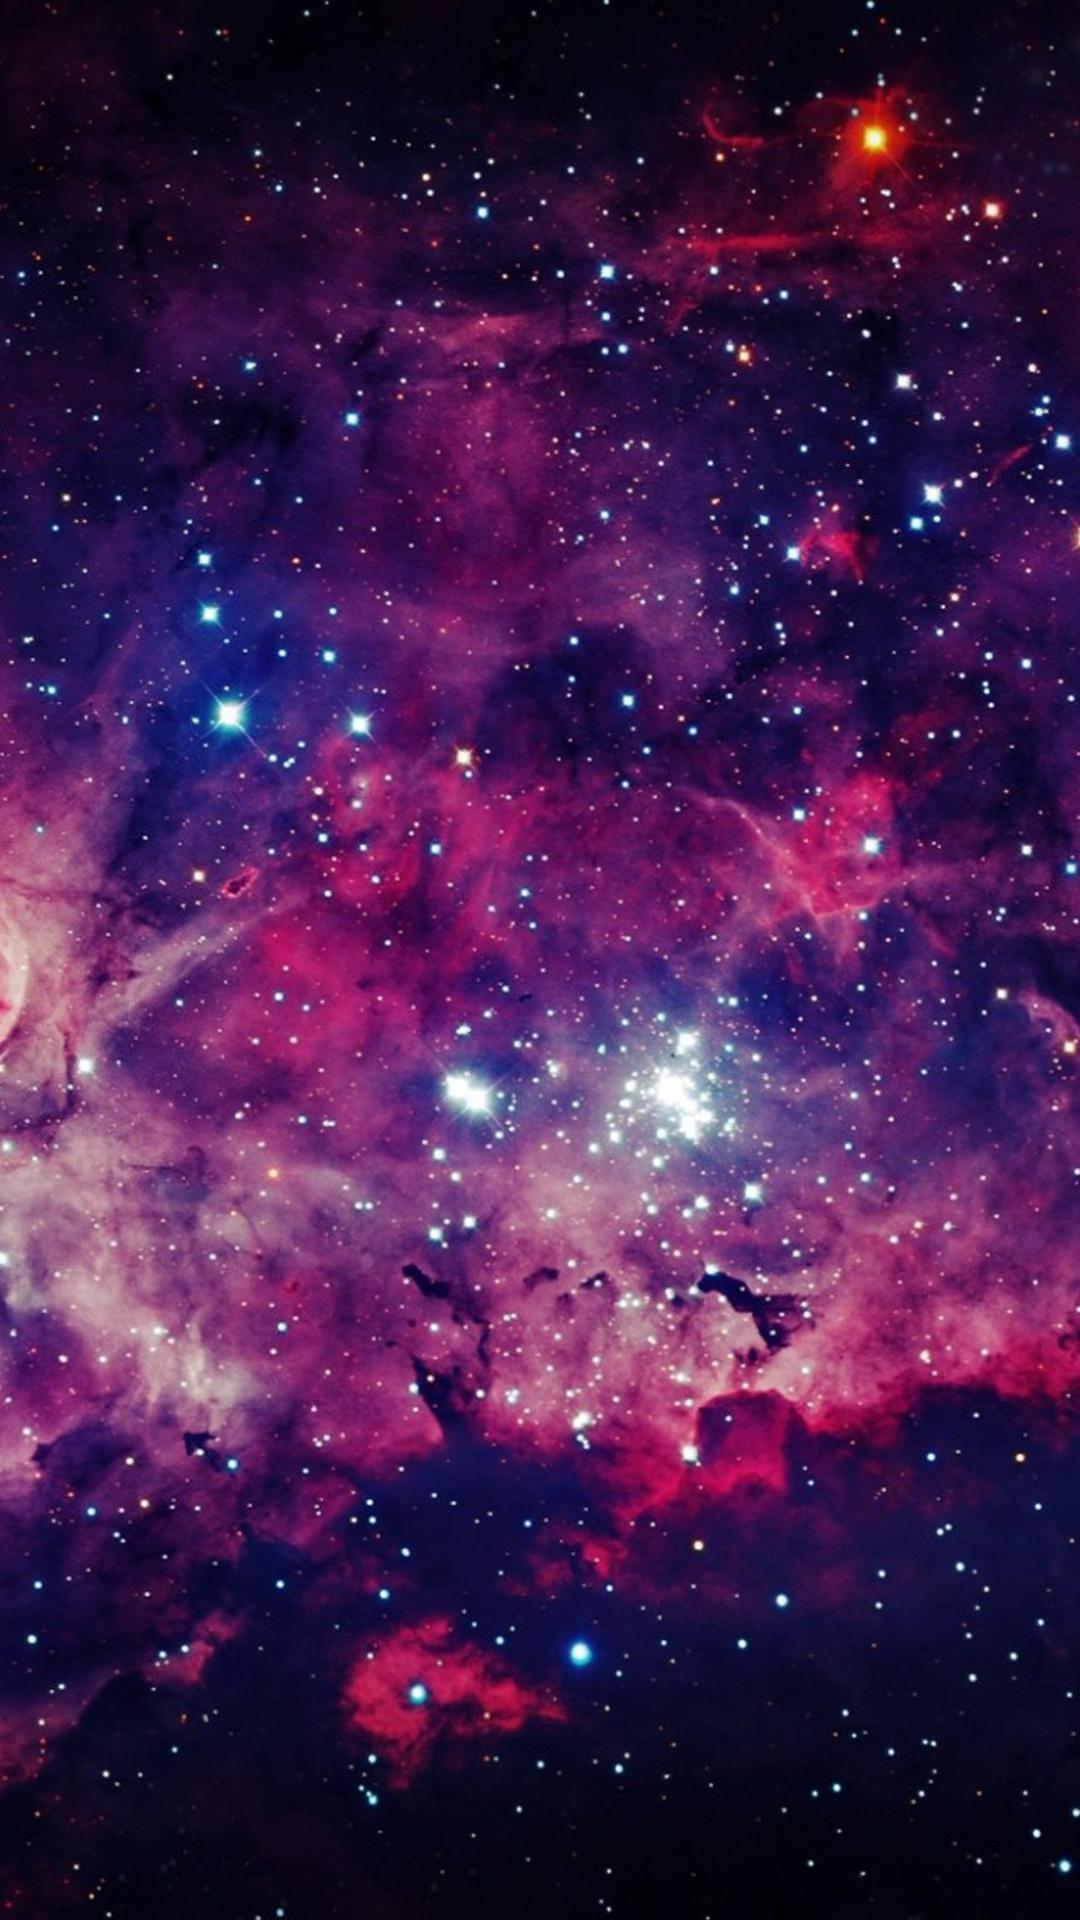 beautiful galaxy wallpaper ❤ | galaxy | pinterest | wallpaper